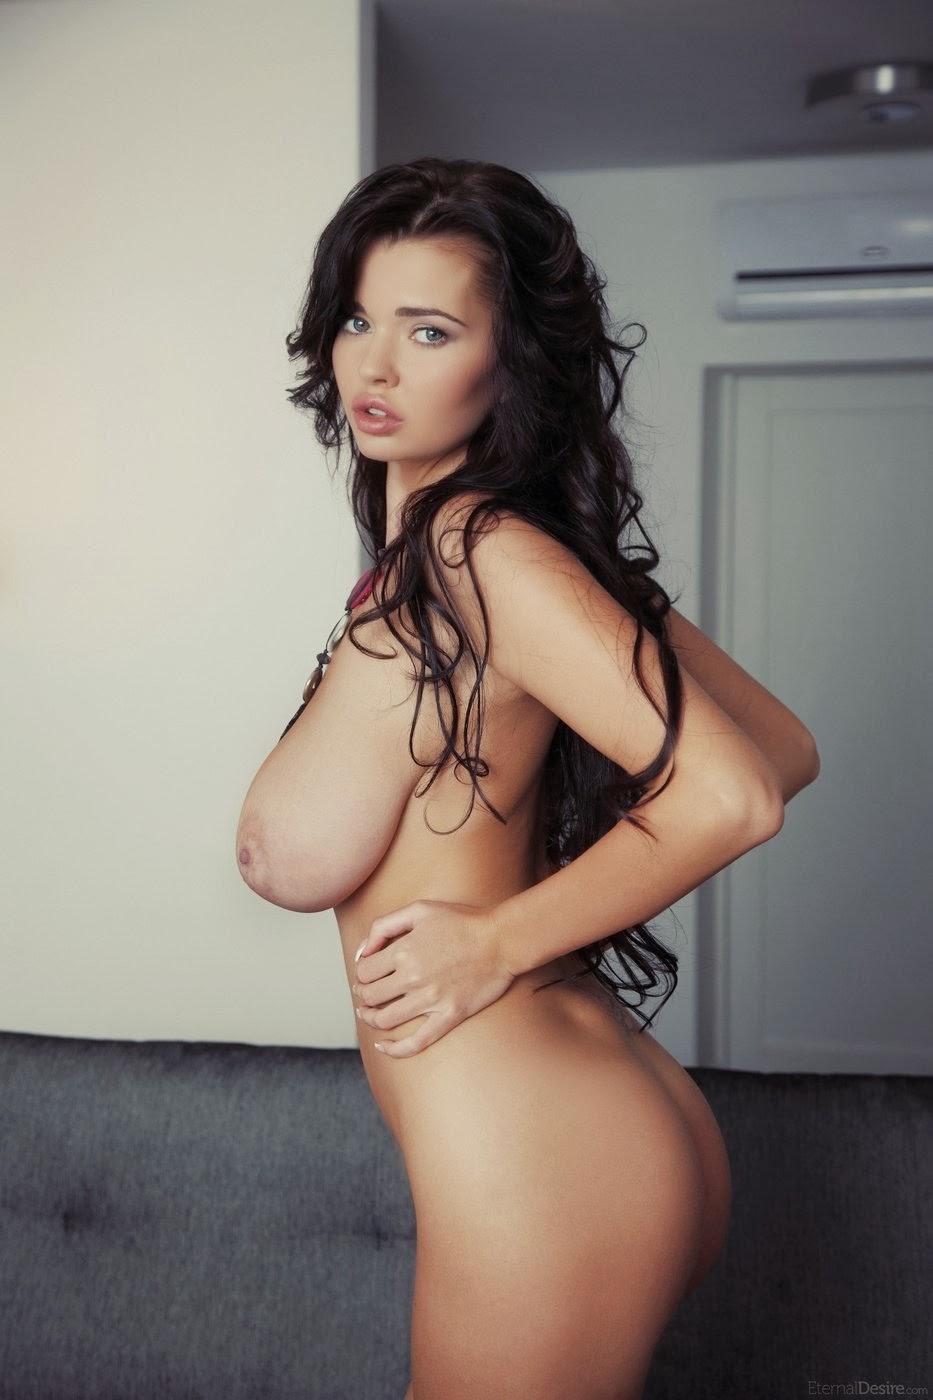 Sophie rundle huge natural boobs in episodes series